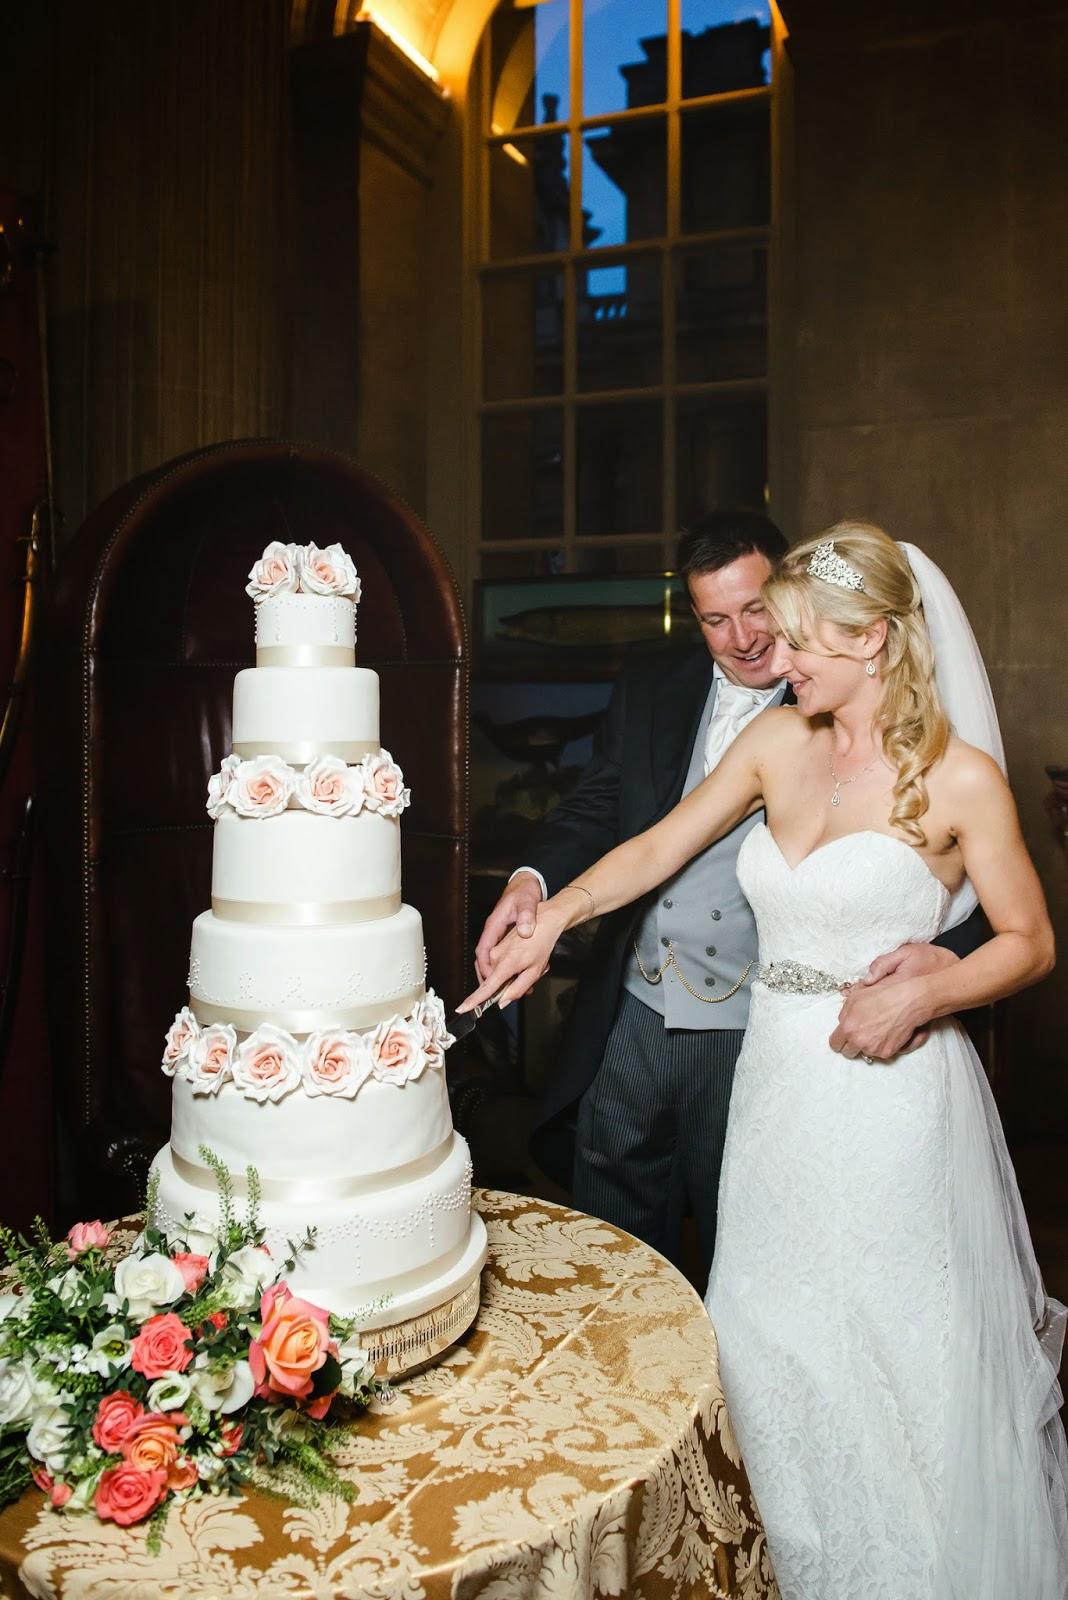 Wedding Cake Flowers - Joanna Carter Wedding Flowers ...